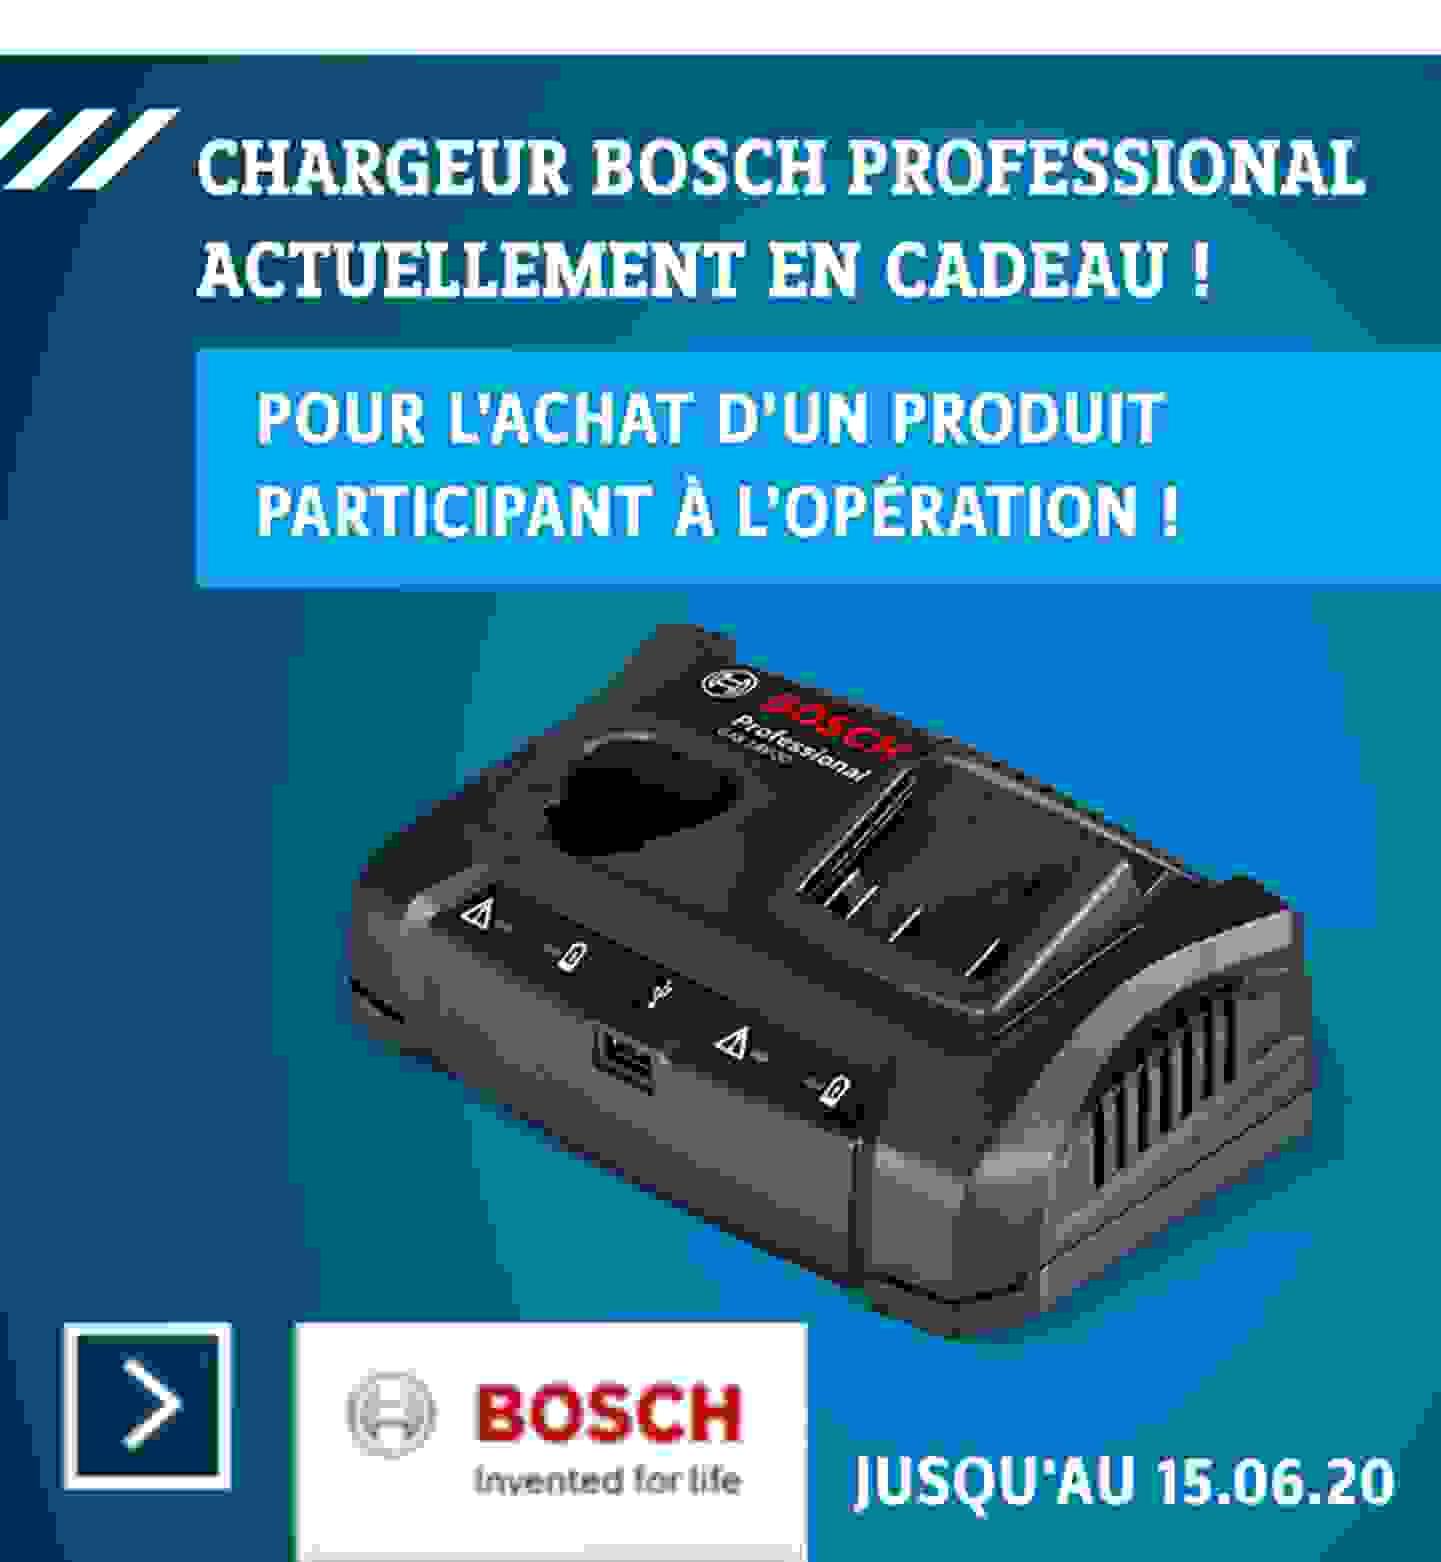 Opération chargeur Bosch